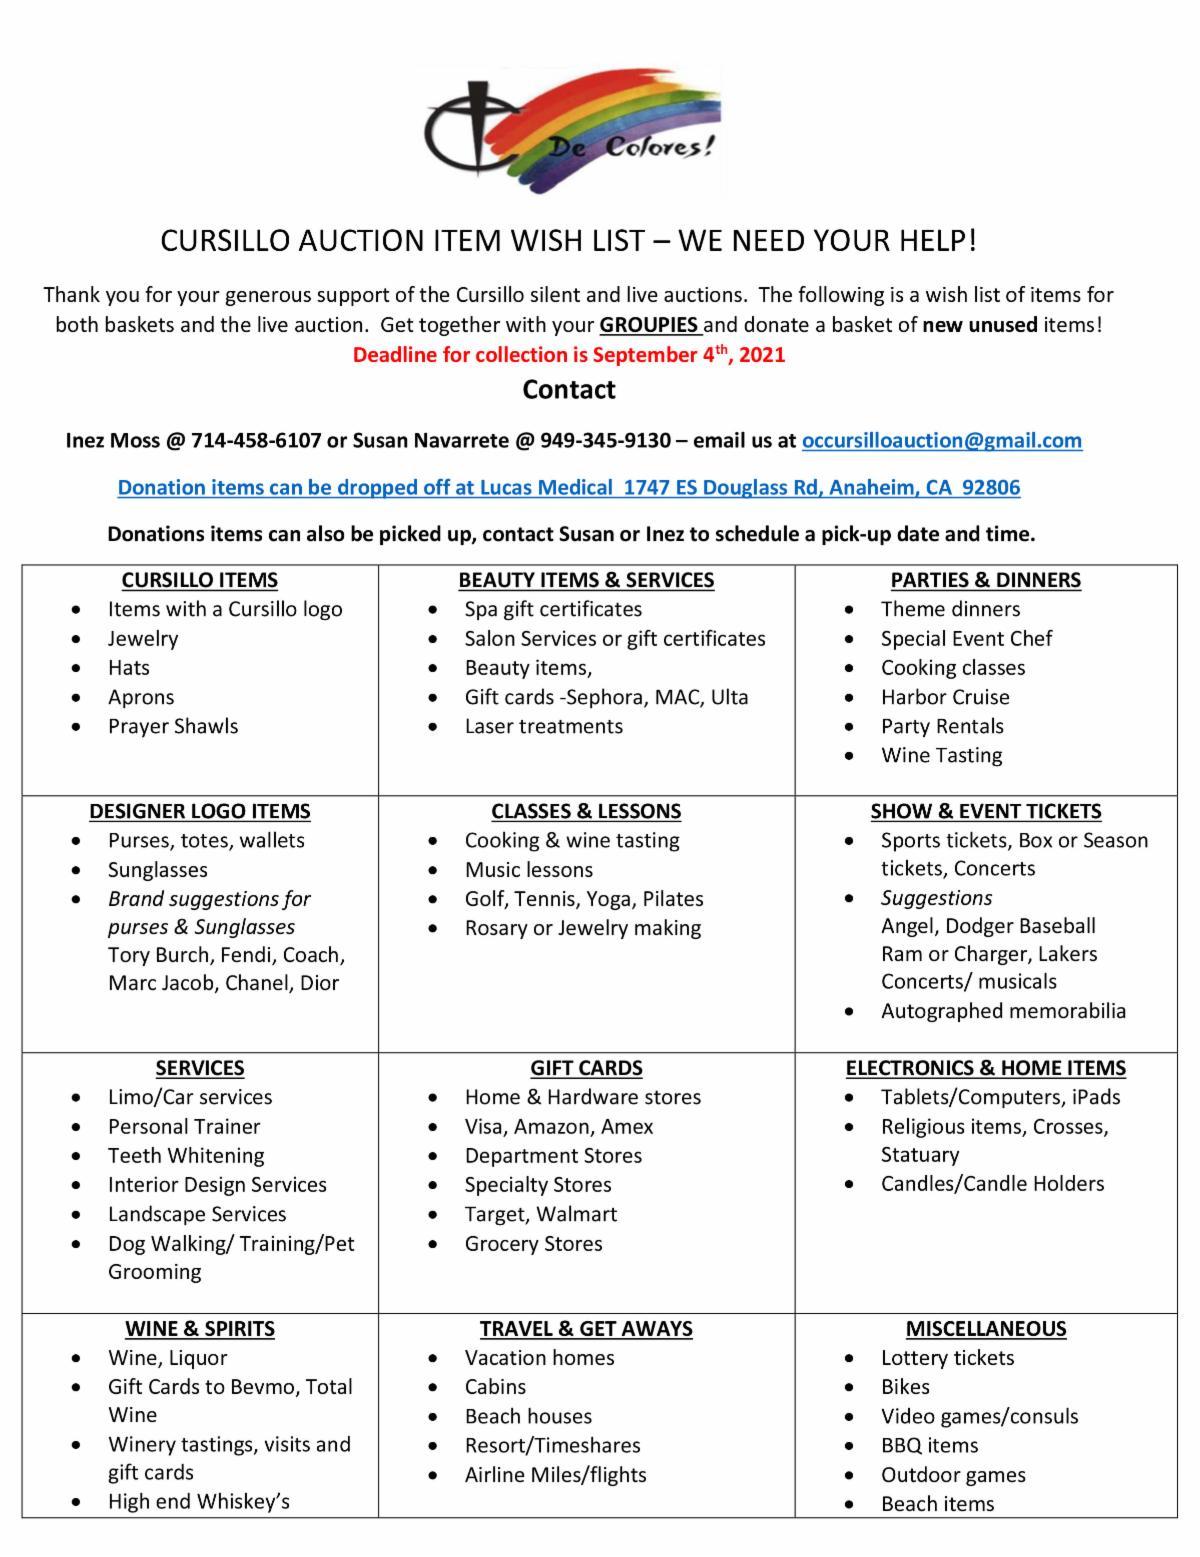 CURSILLO AUCTION ITEM WISH LIST 7-10-2021.jpg